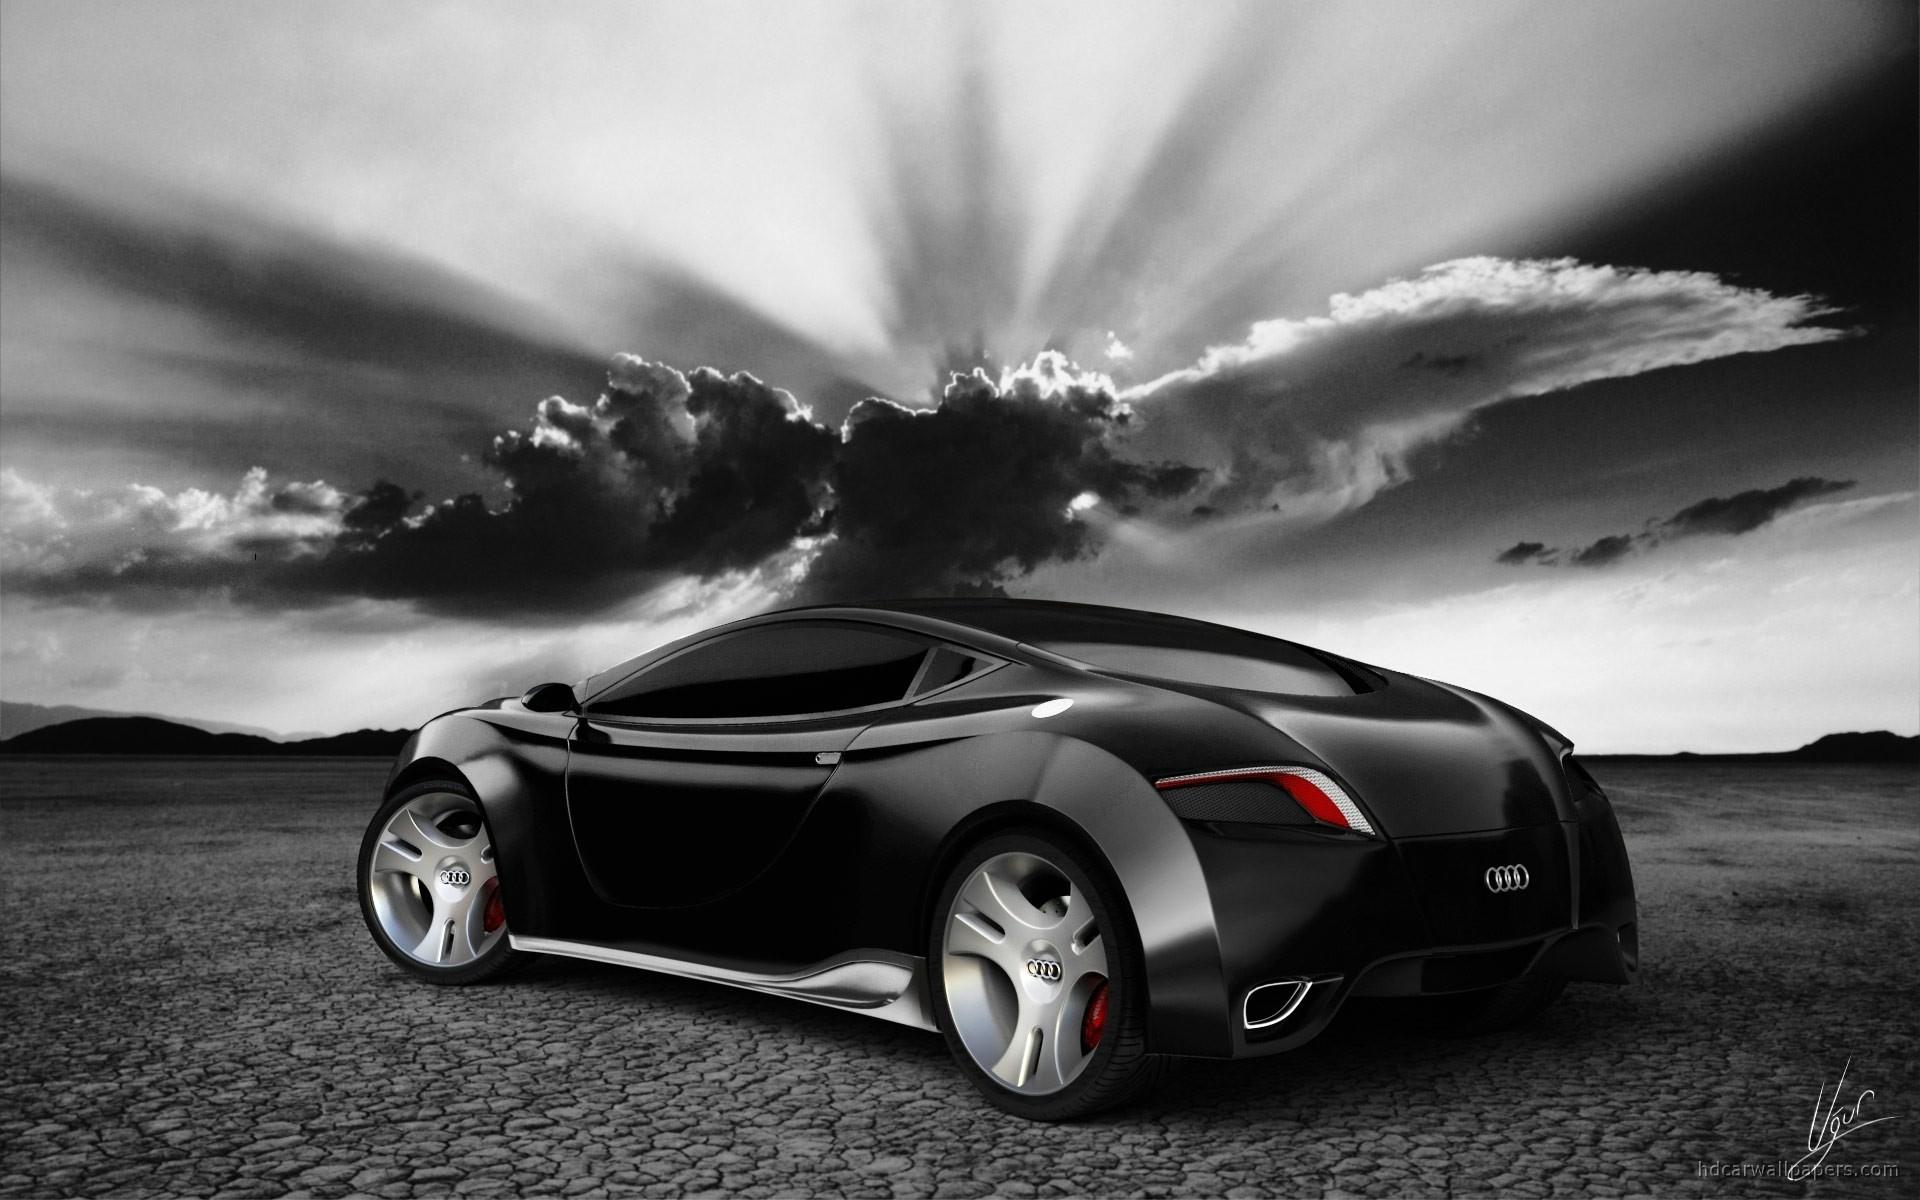 Hd Wallpapers 1080p Widescreen Cars Free Download Audi 2020 Wallpaper Hd Car Wallpapers Id 102